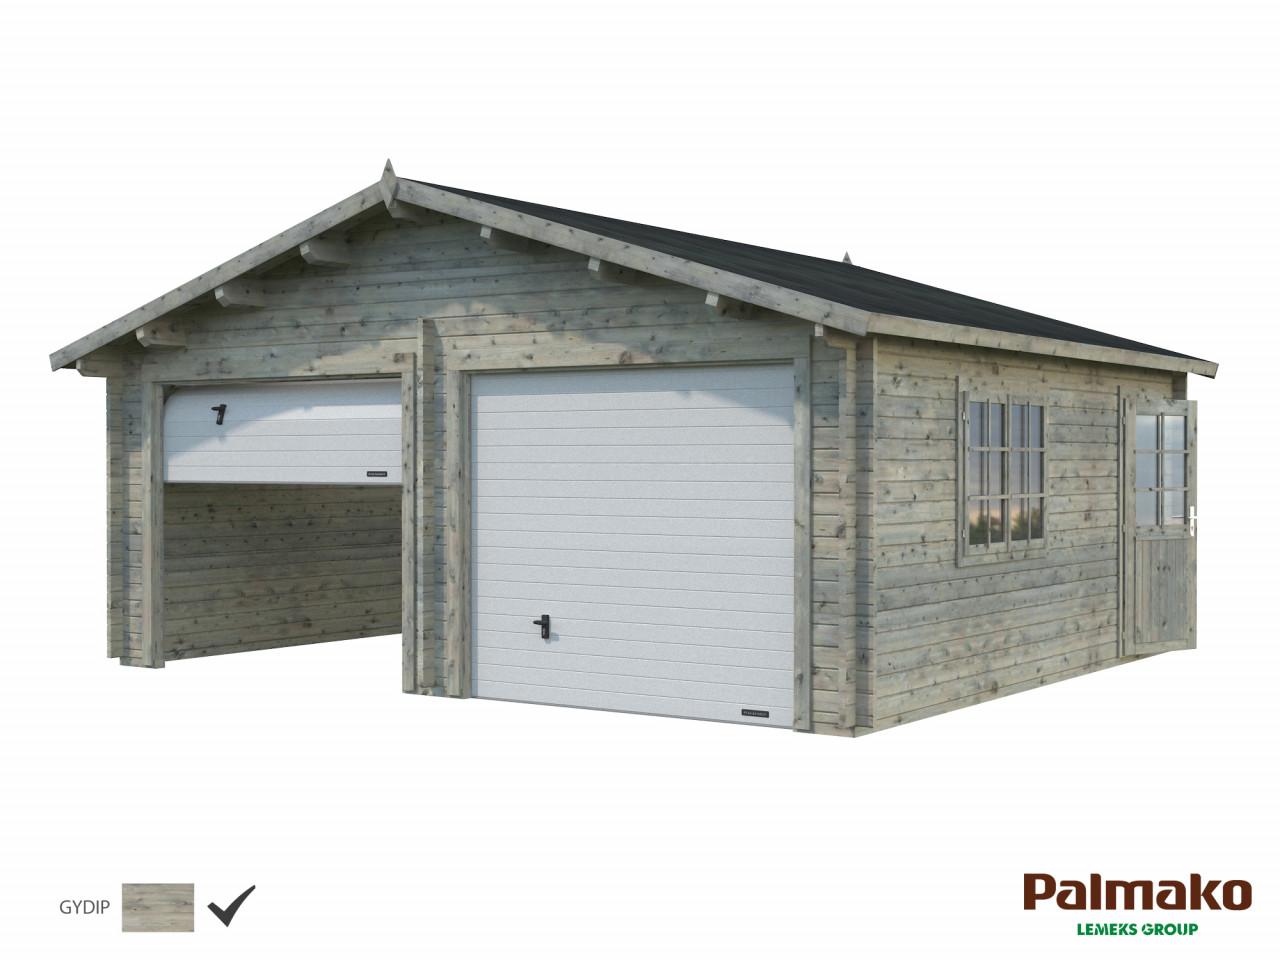 Palmako Holzgarage Roger 28,4 m² mit Sektionaltor